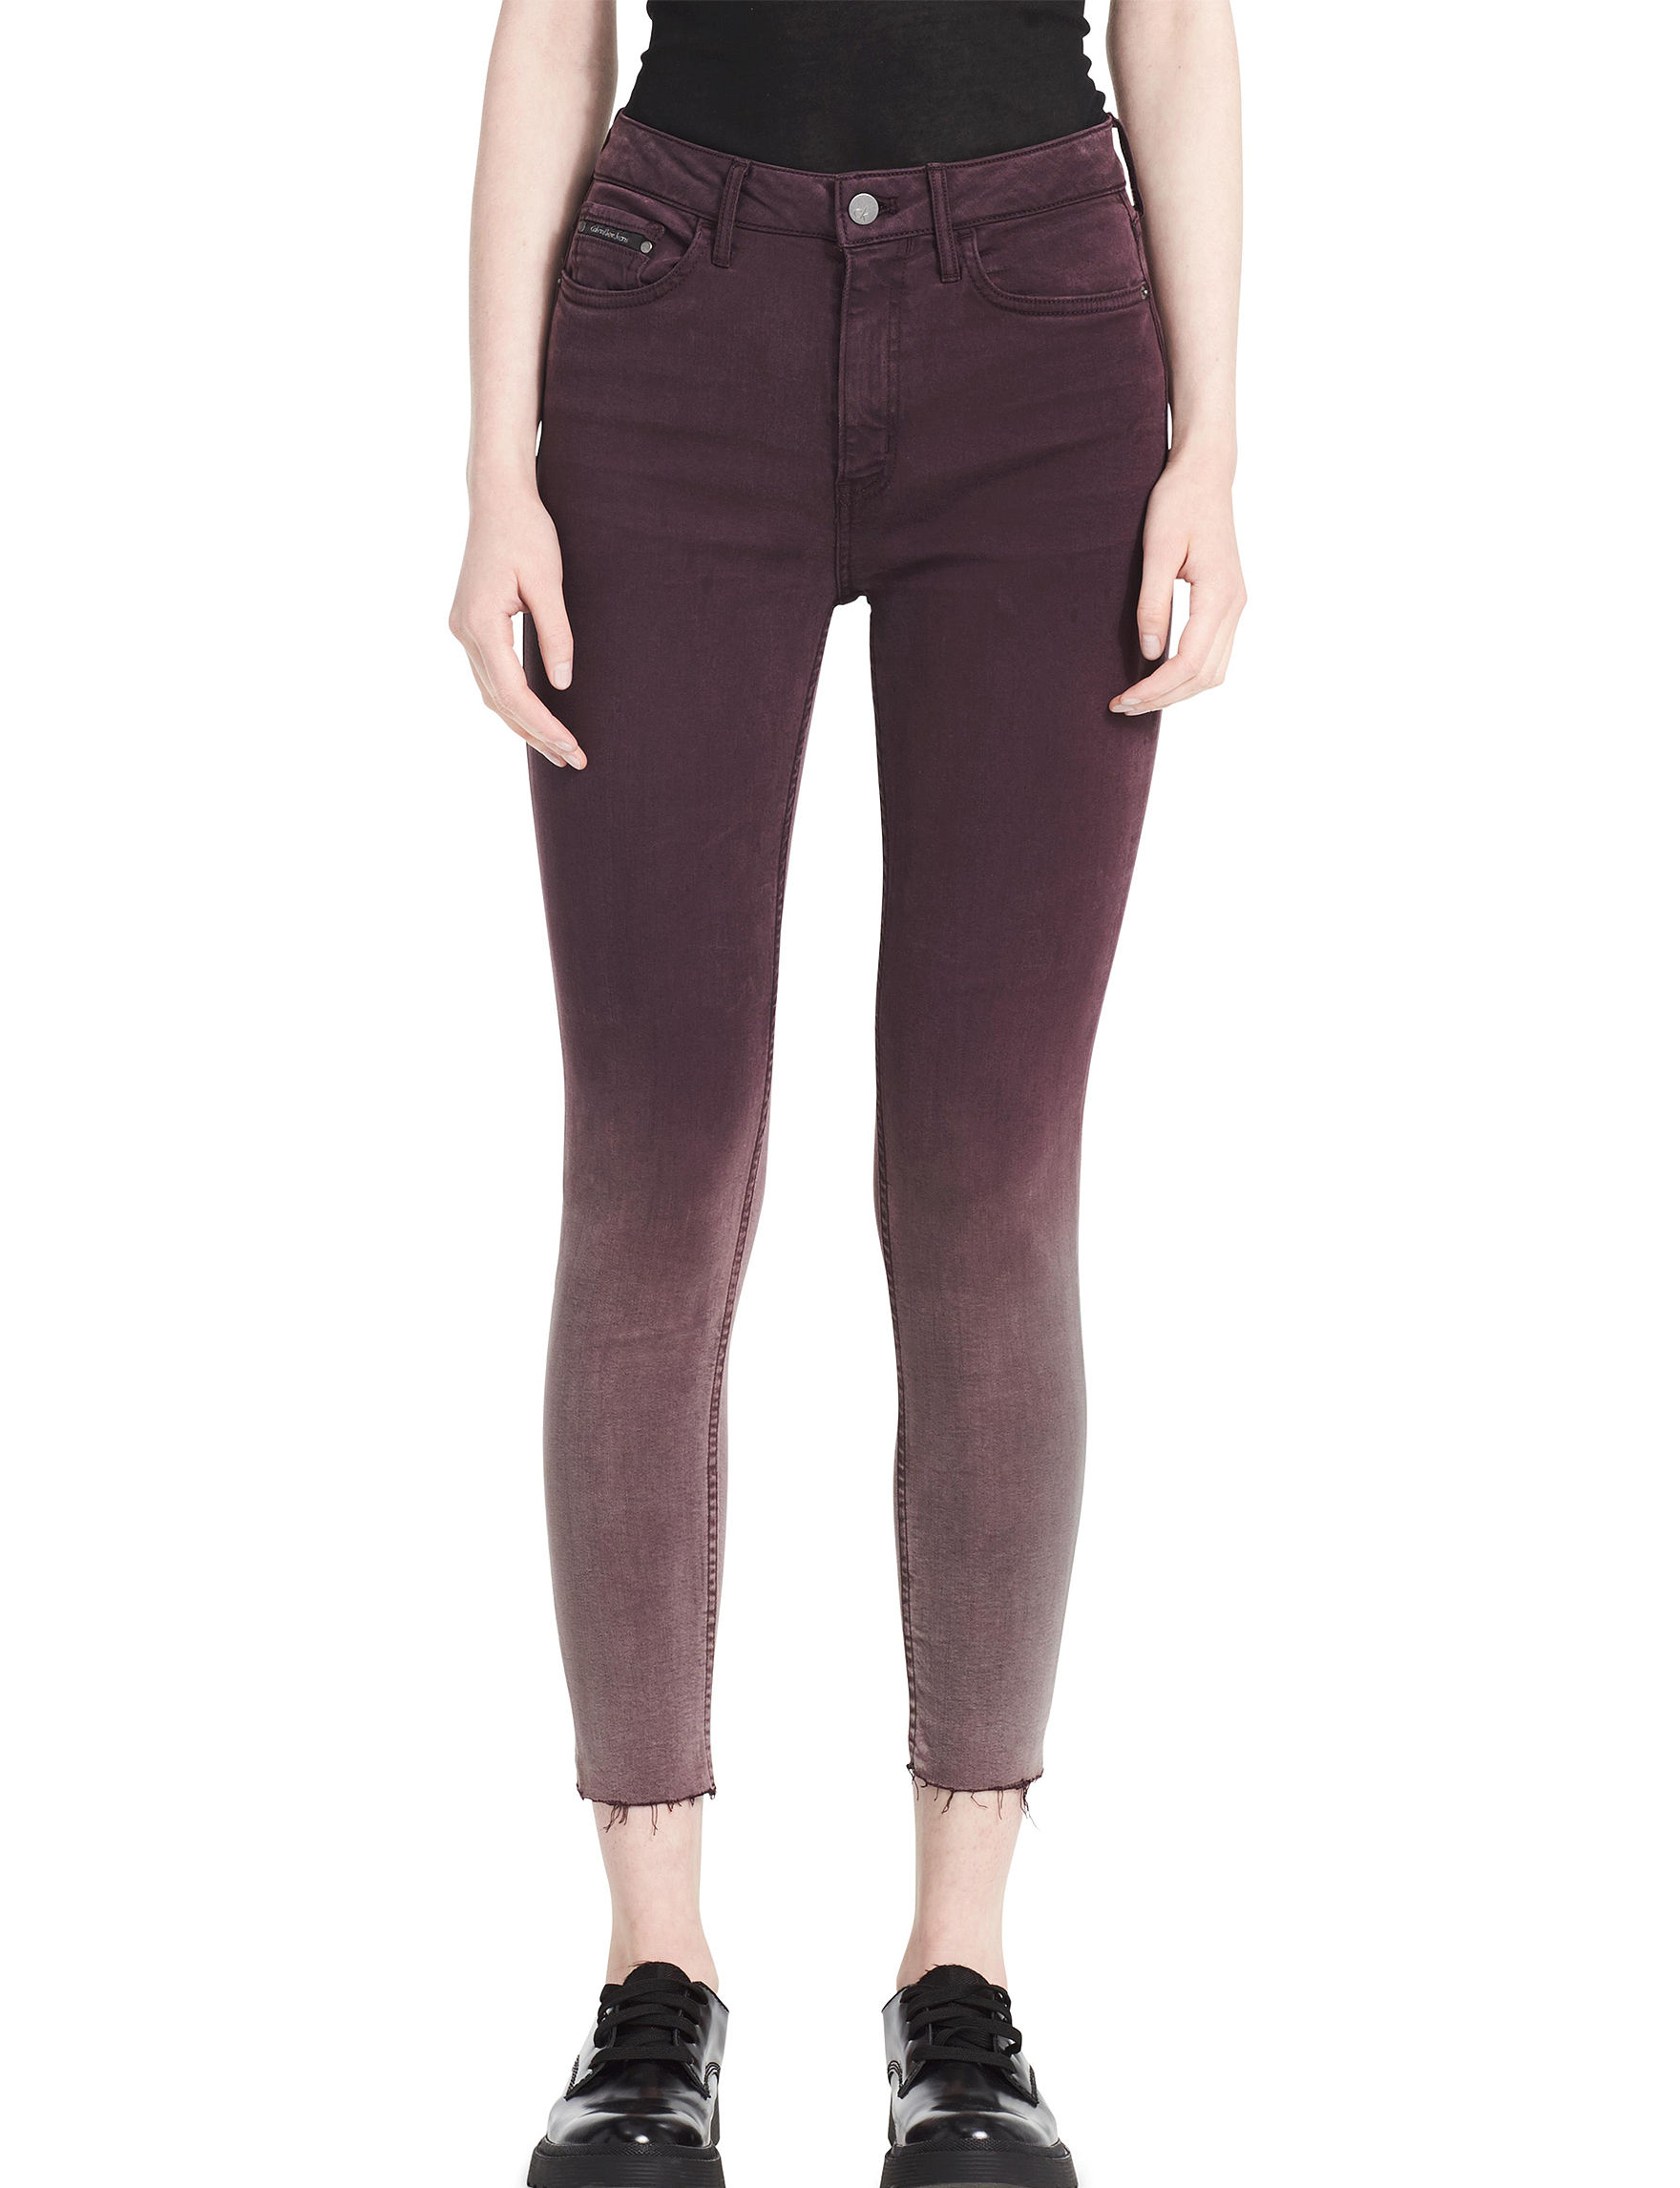 Calvin Klein Jeans Wine Skinny Soft Pants